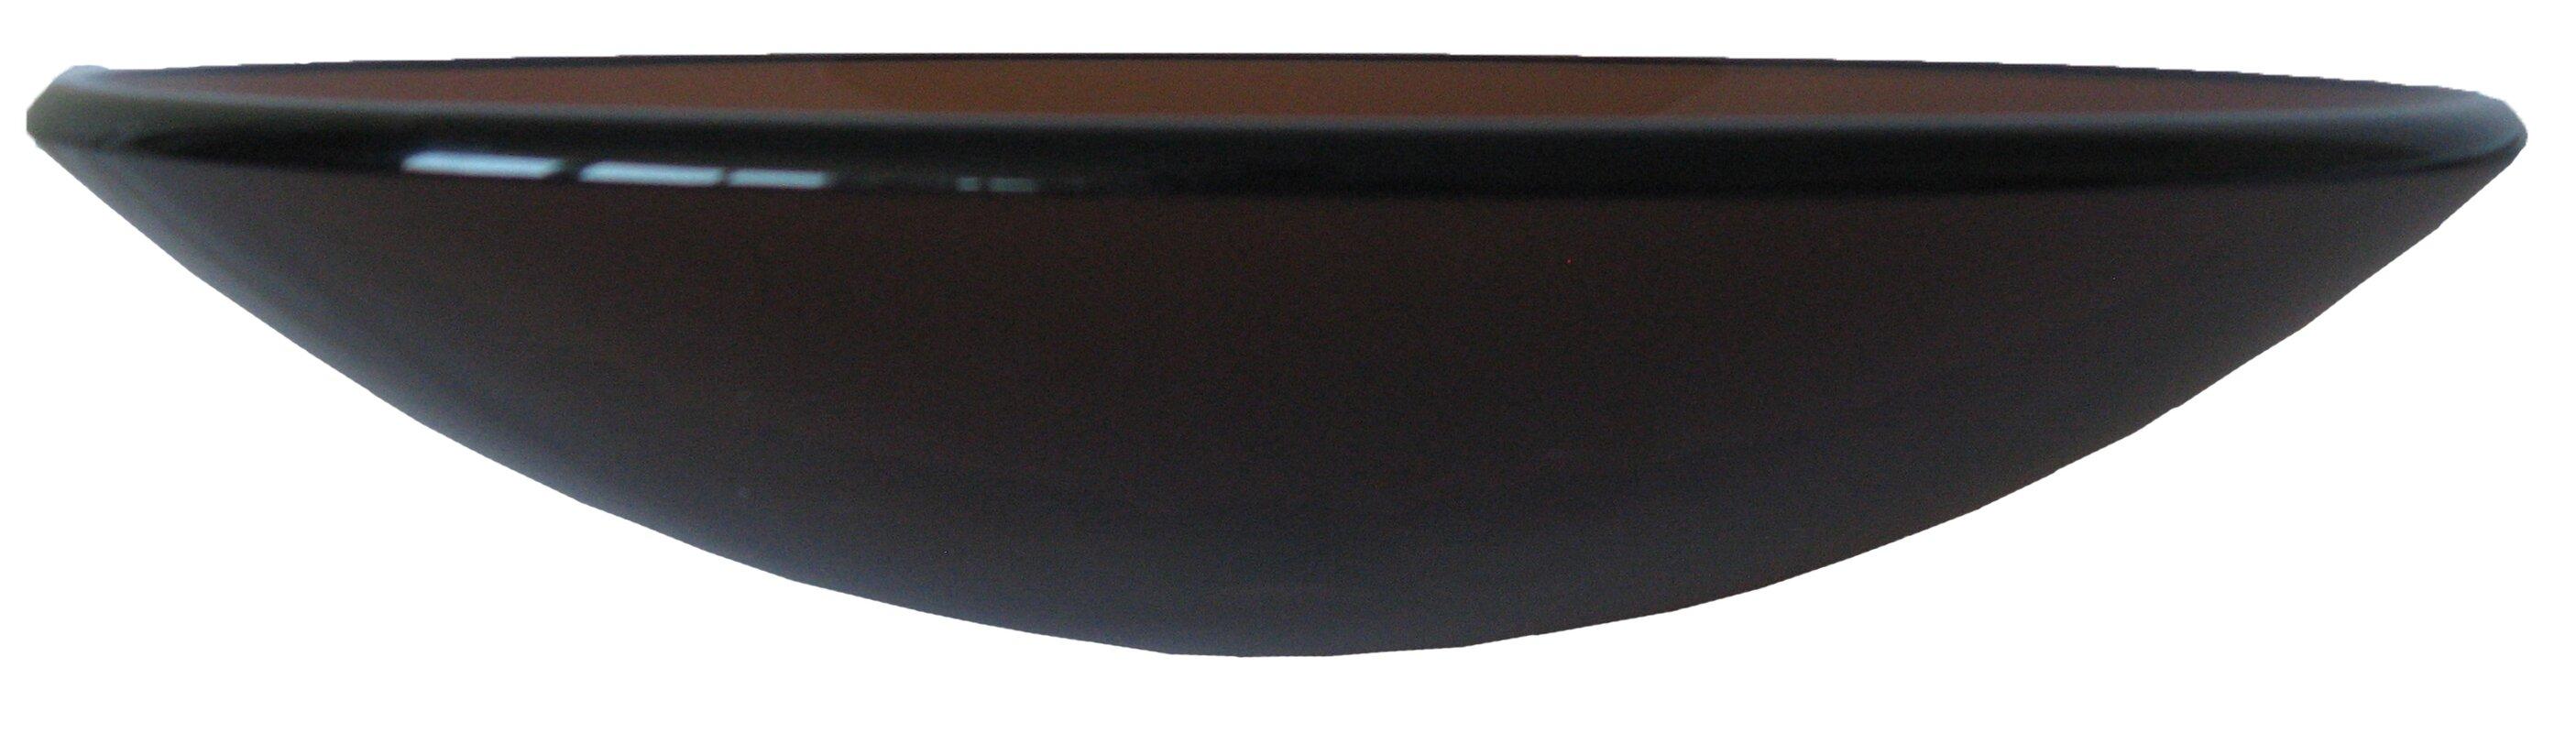 novatto low profile glass circular vessel bathroom sink